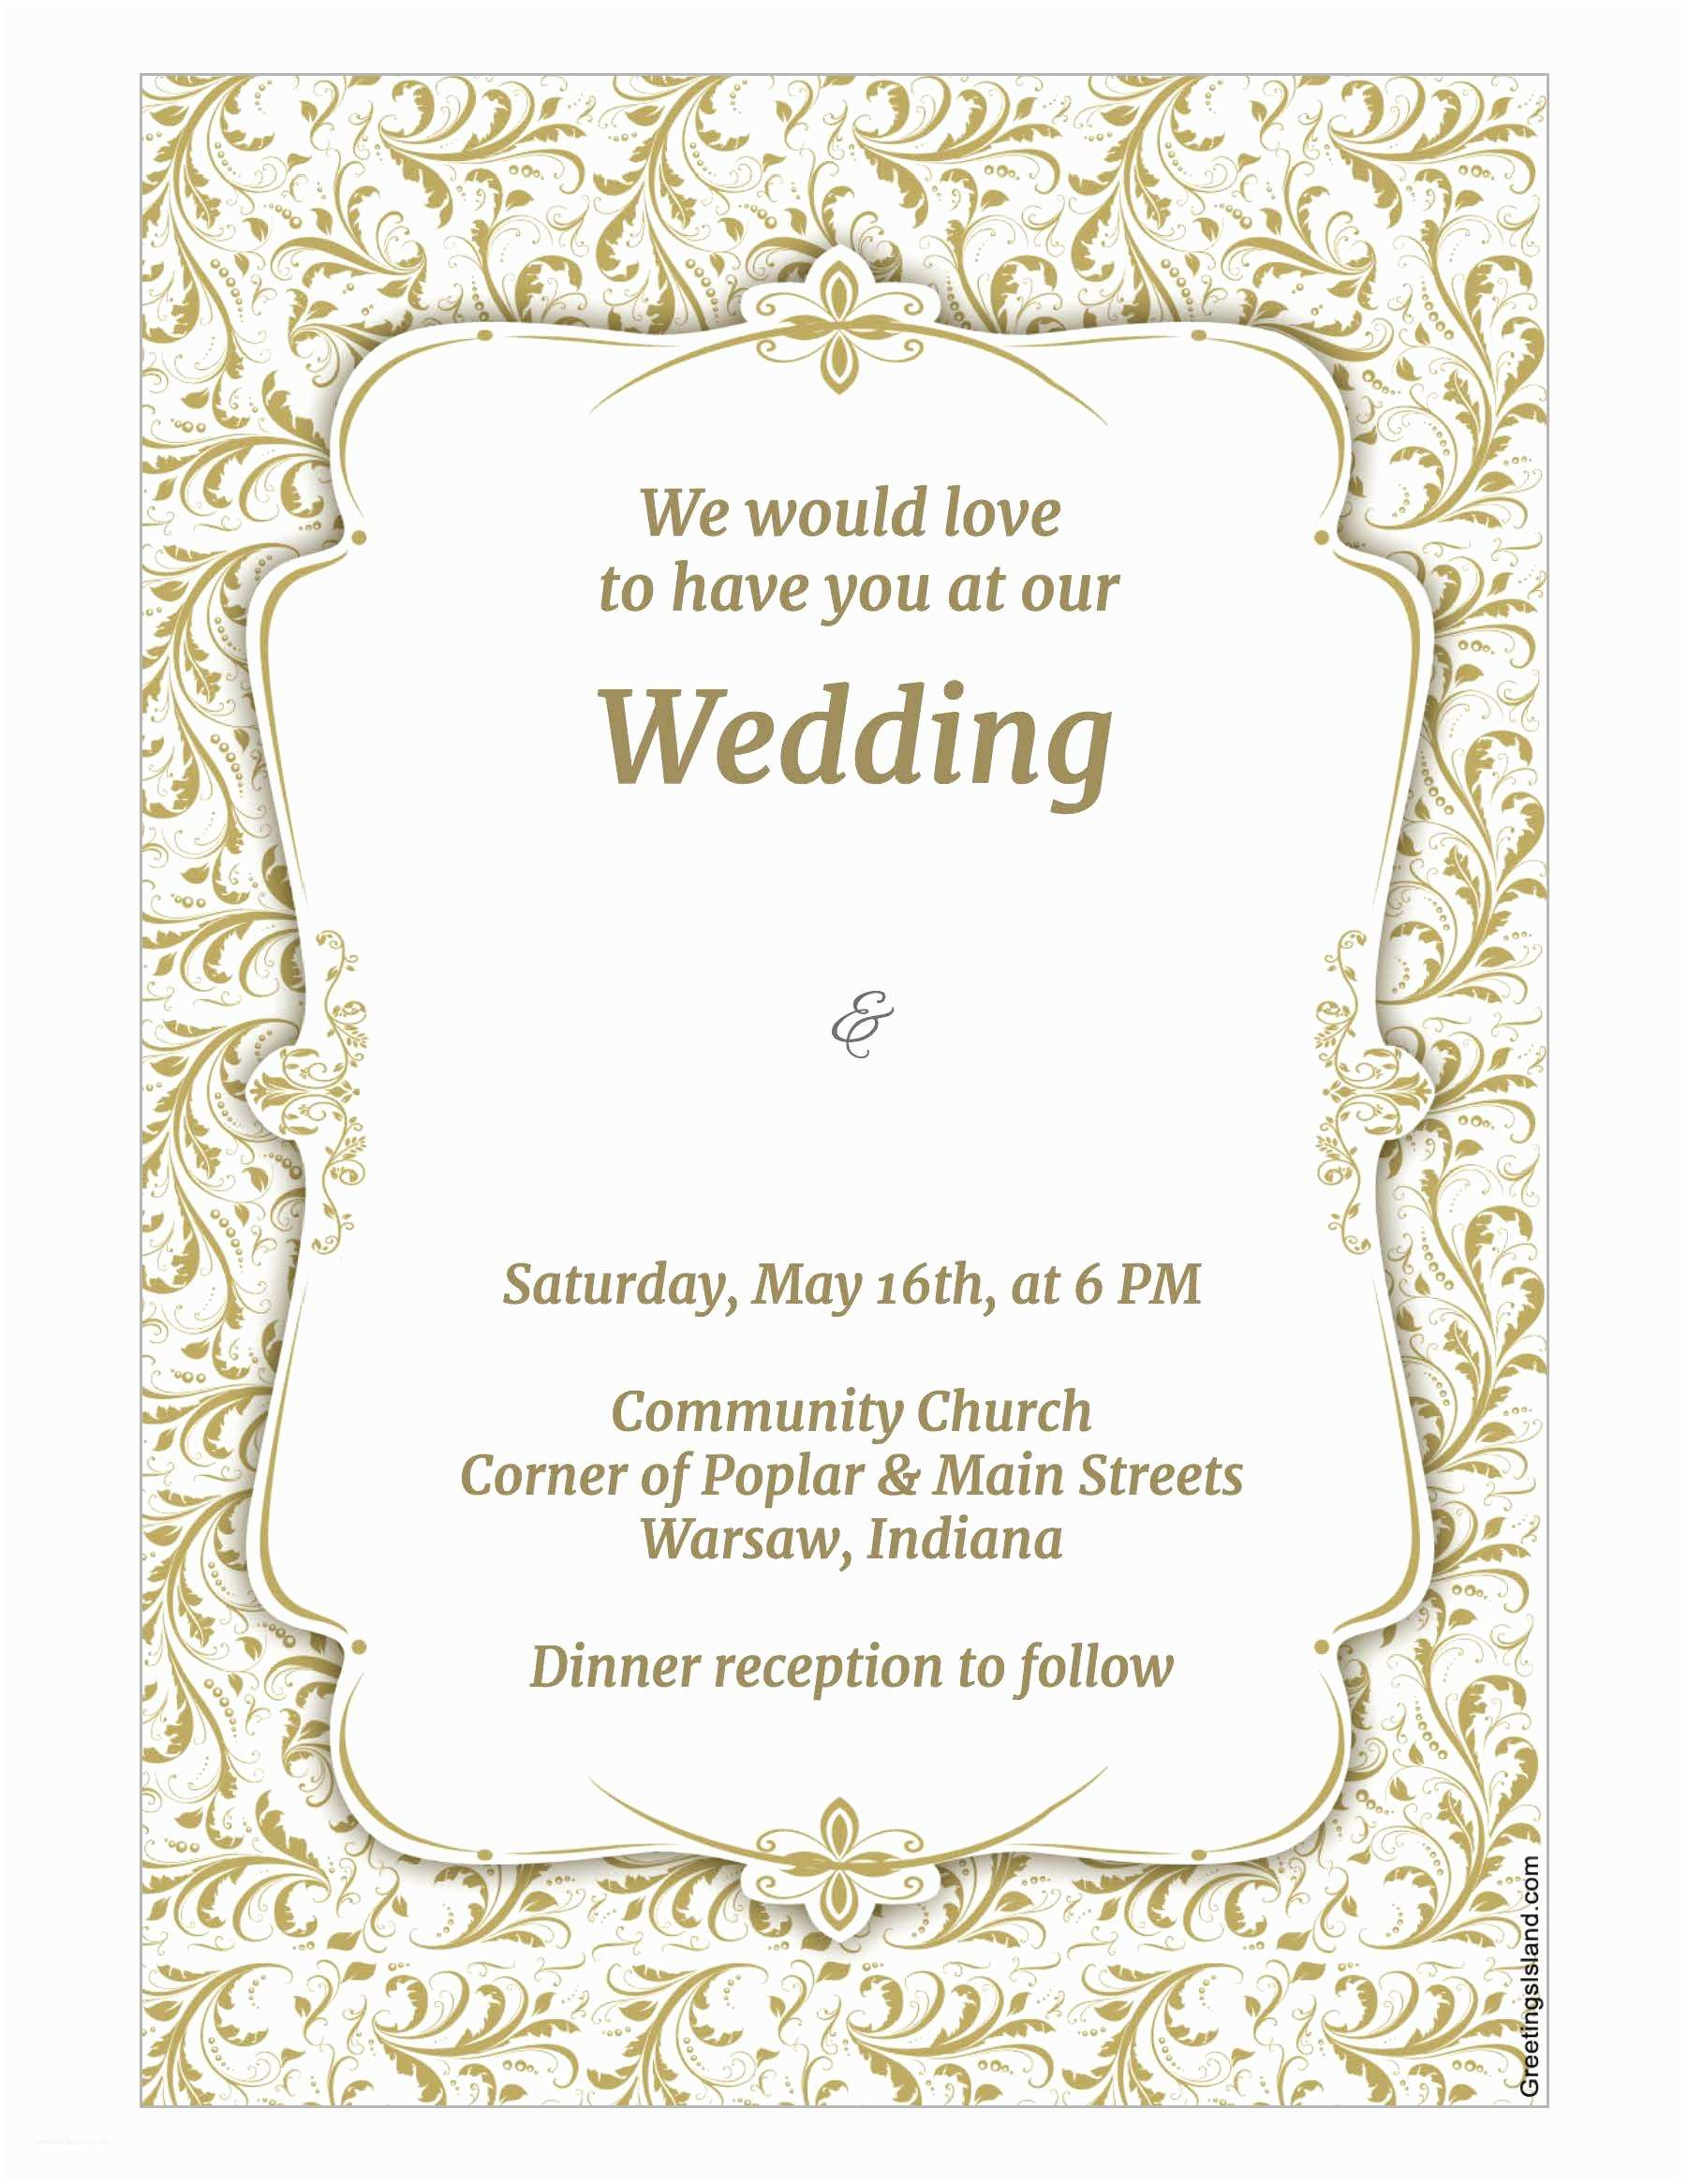 Wedding Invitation With Photo Templates Download Wedding Invitation Template